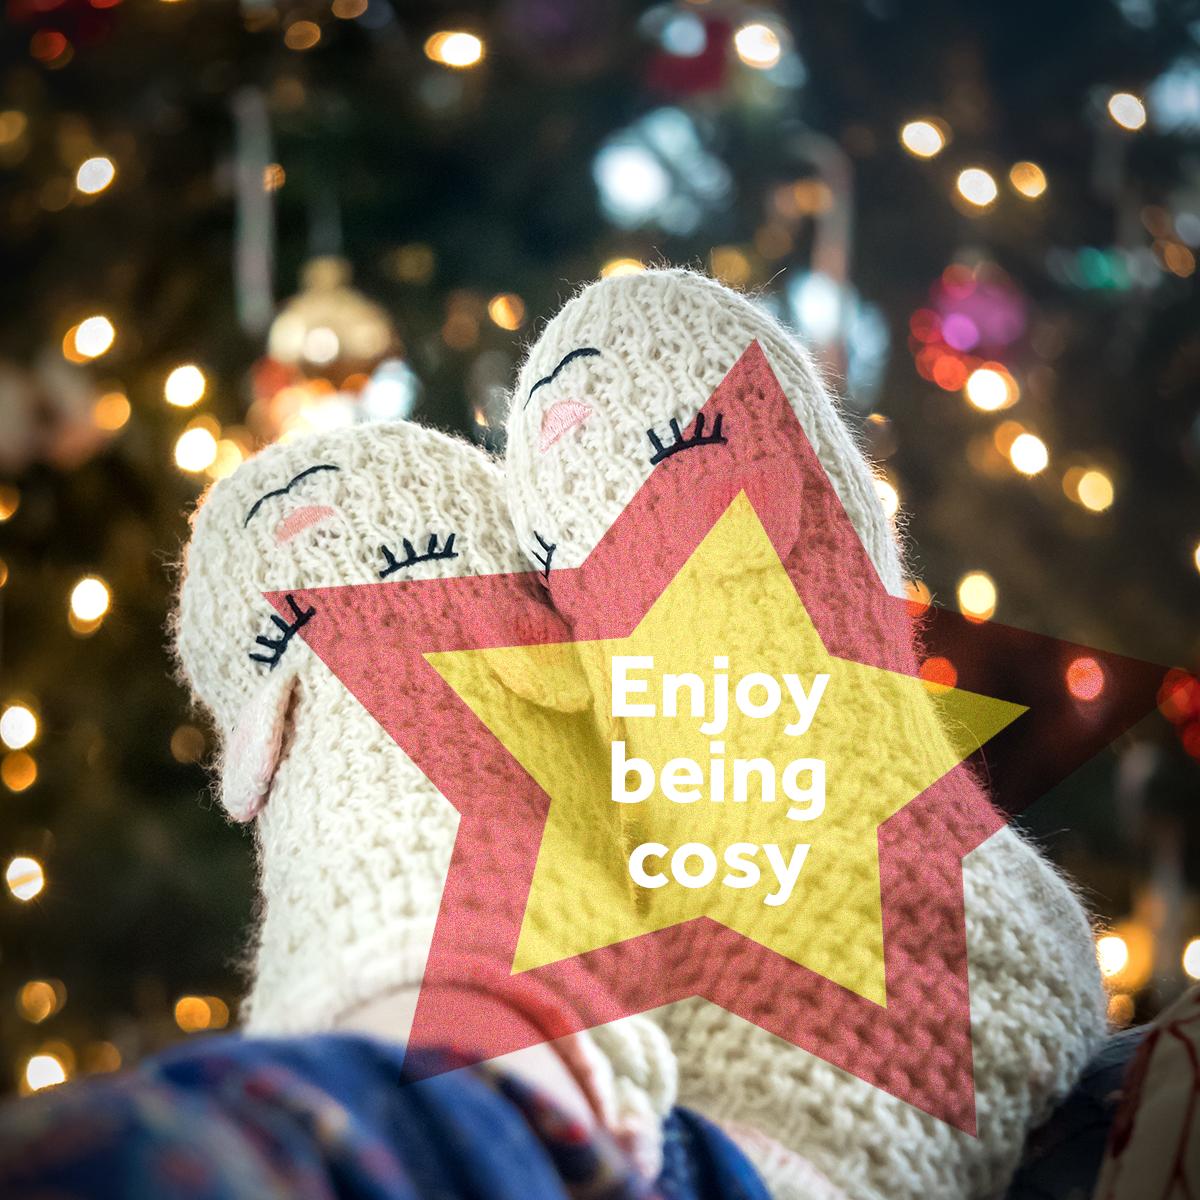 Festive Spirit - Enjoy being cosy